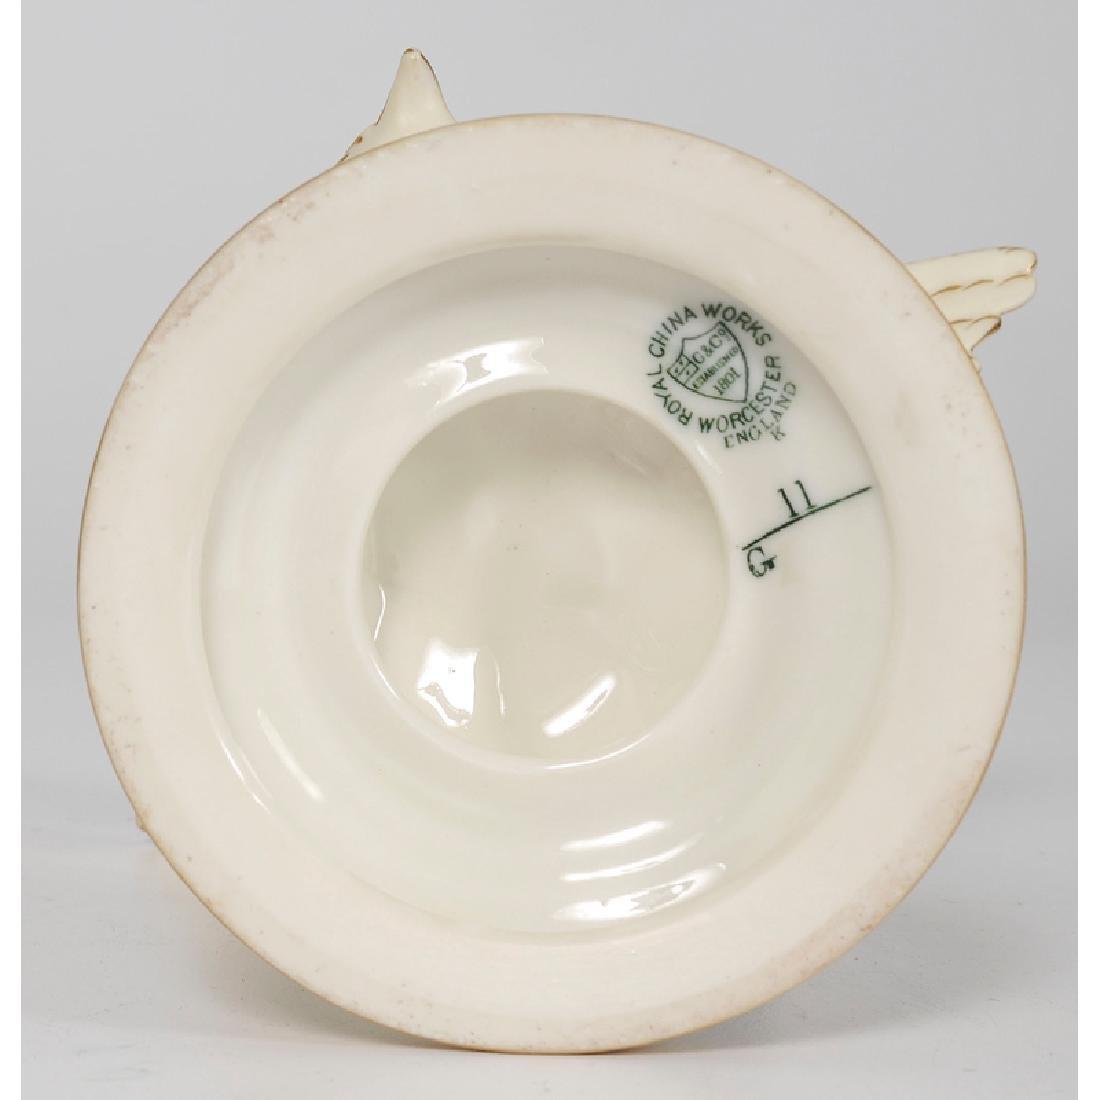 Grainger & Co. for Worcester Porcelain Potpourri - 2